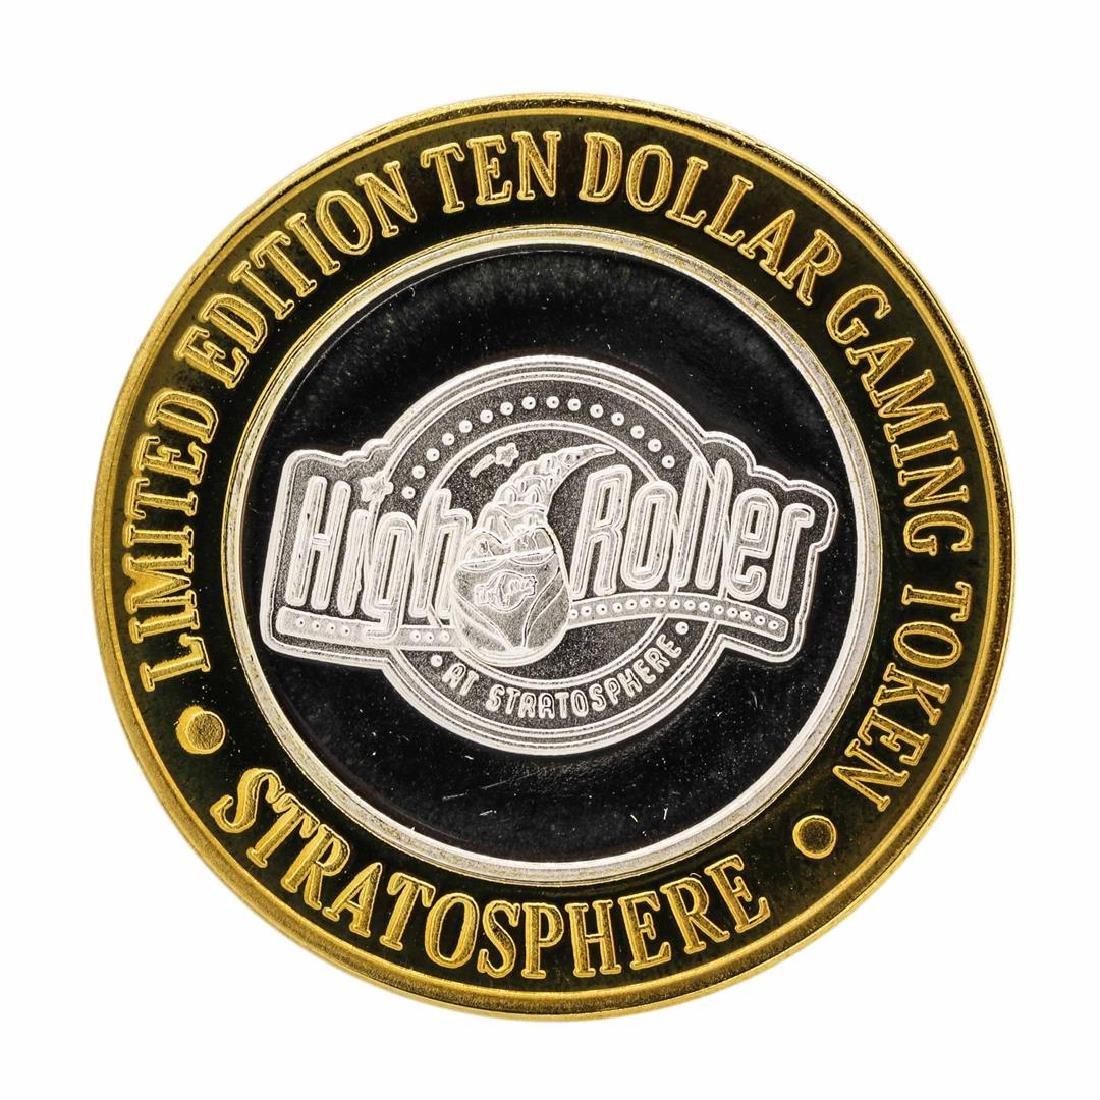 .999 Silver Stratosphere Las Vegas, NV $10 Casino